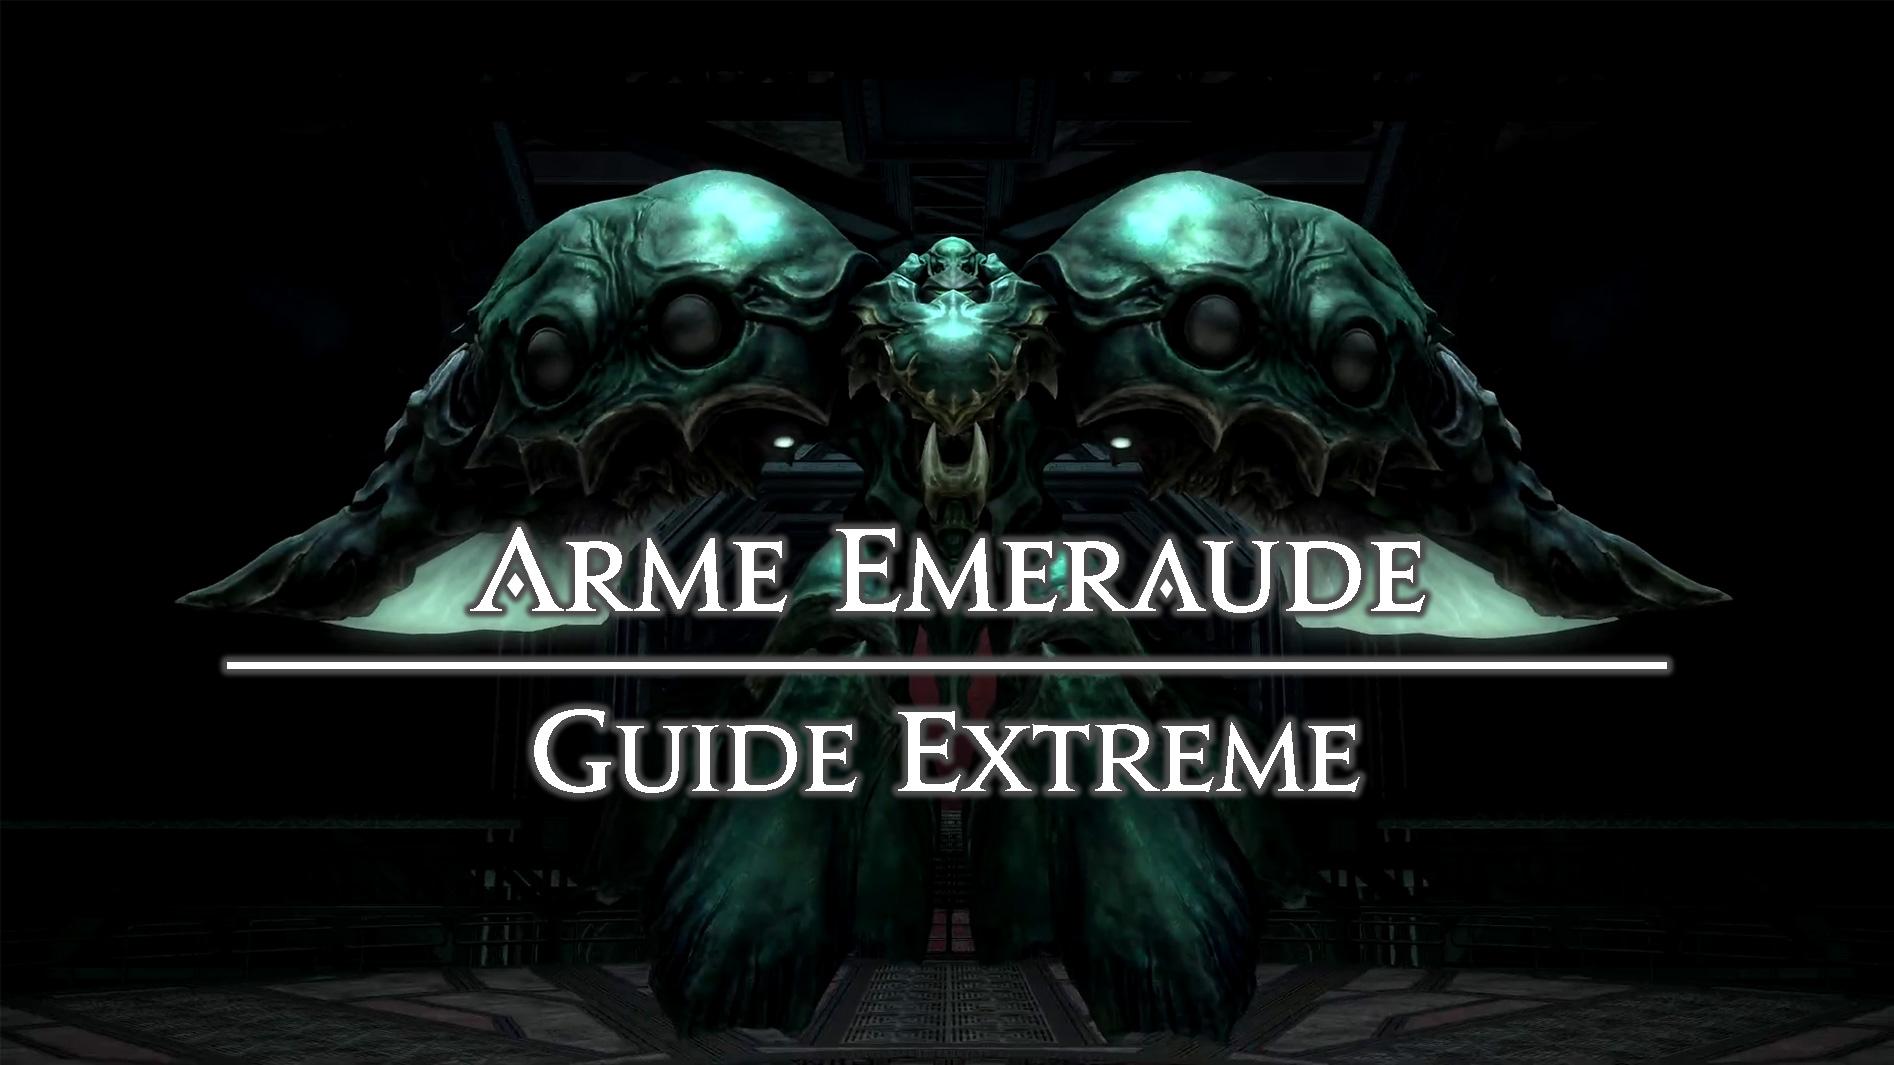 Illustration - Guide Arme émeraude Extrême